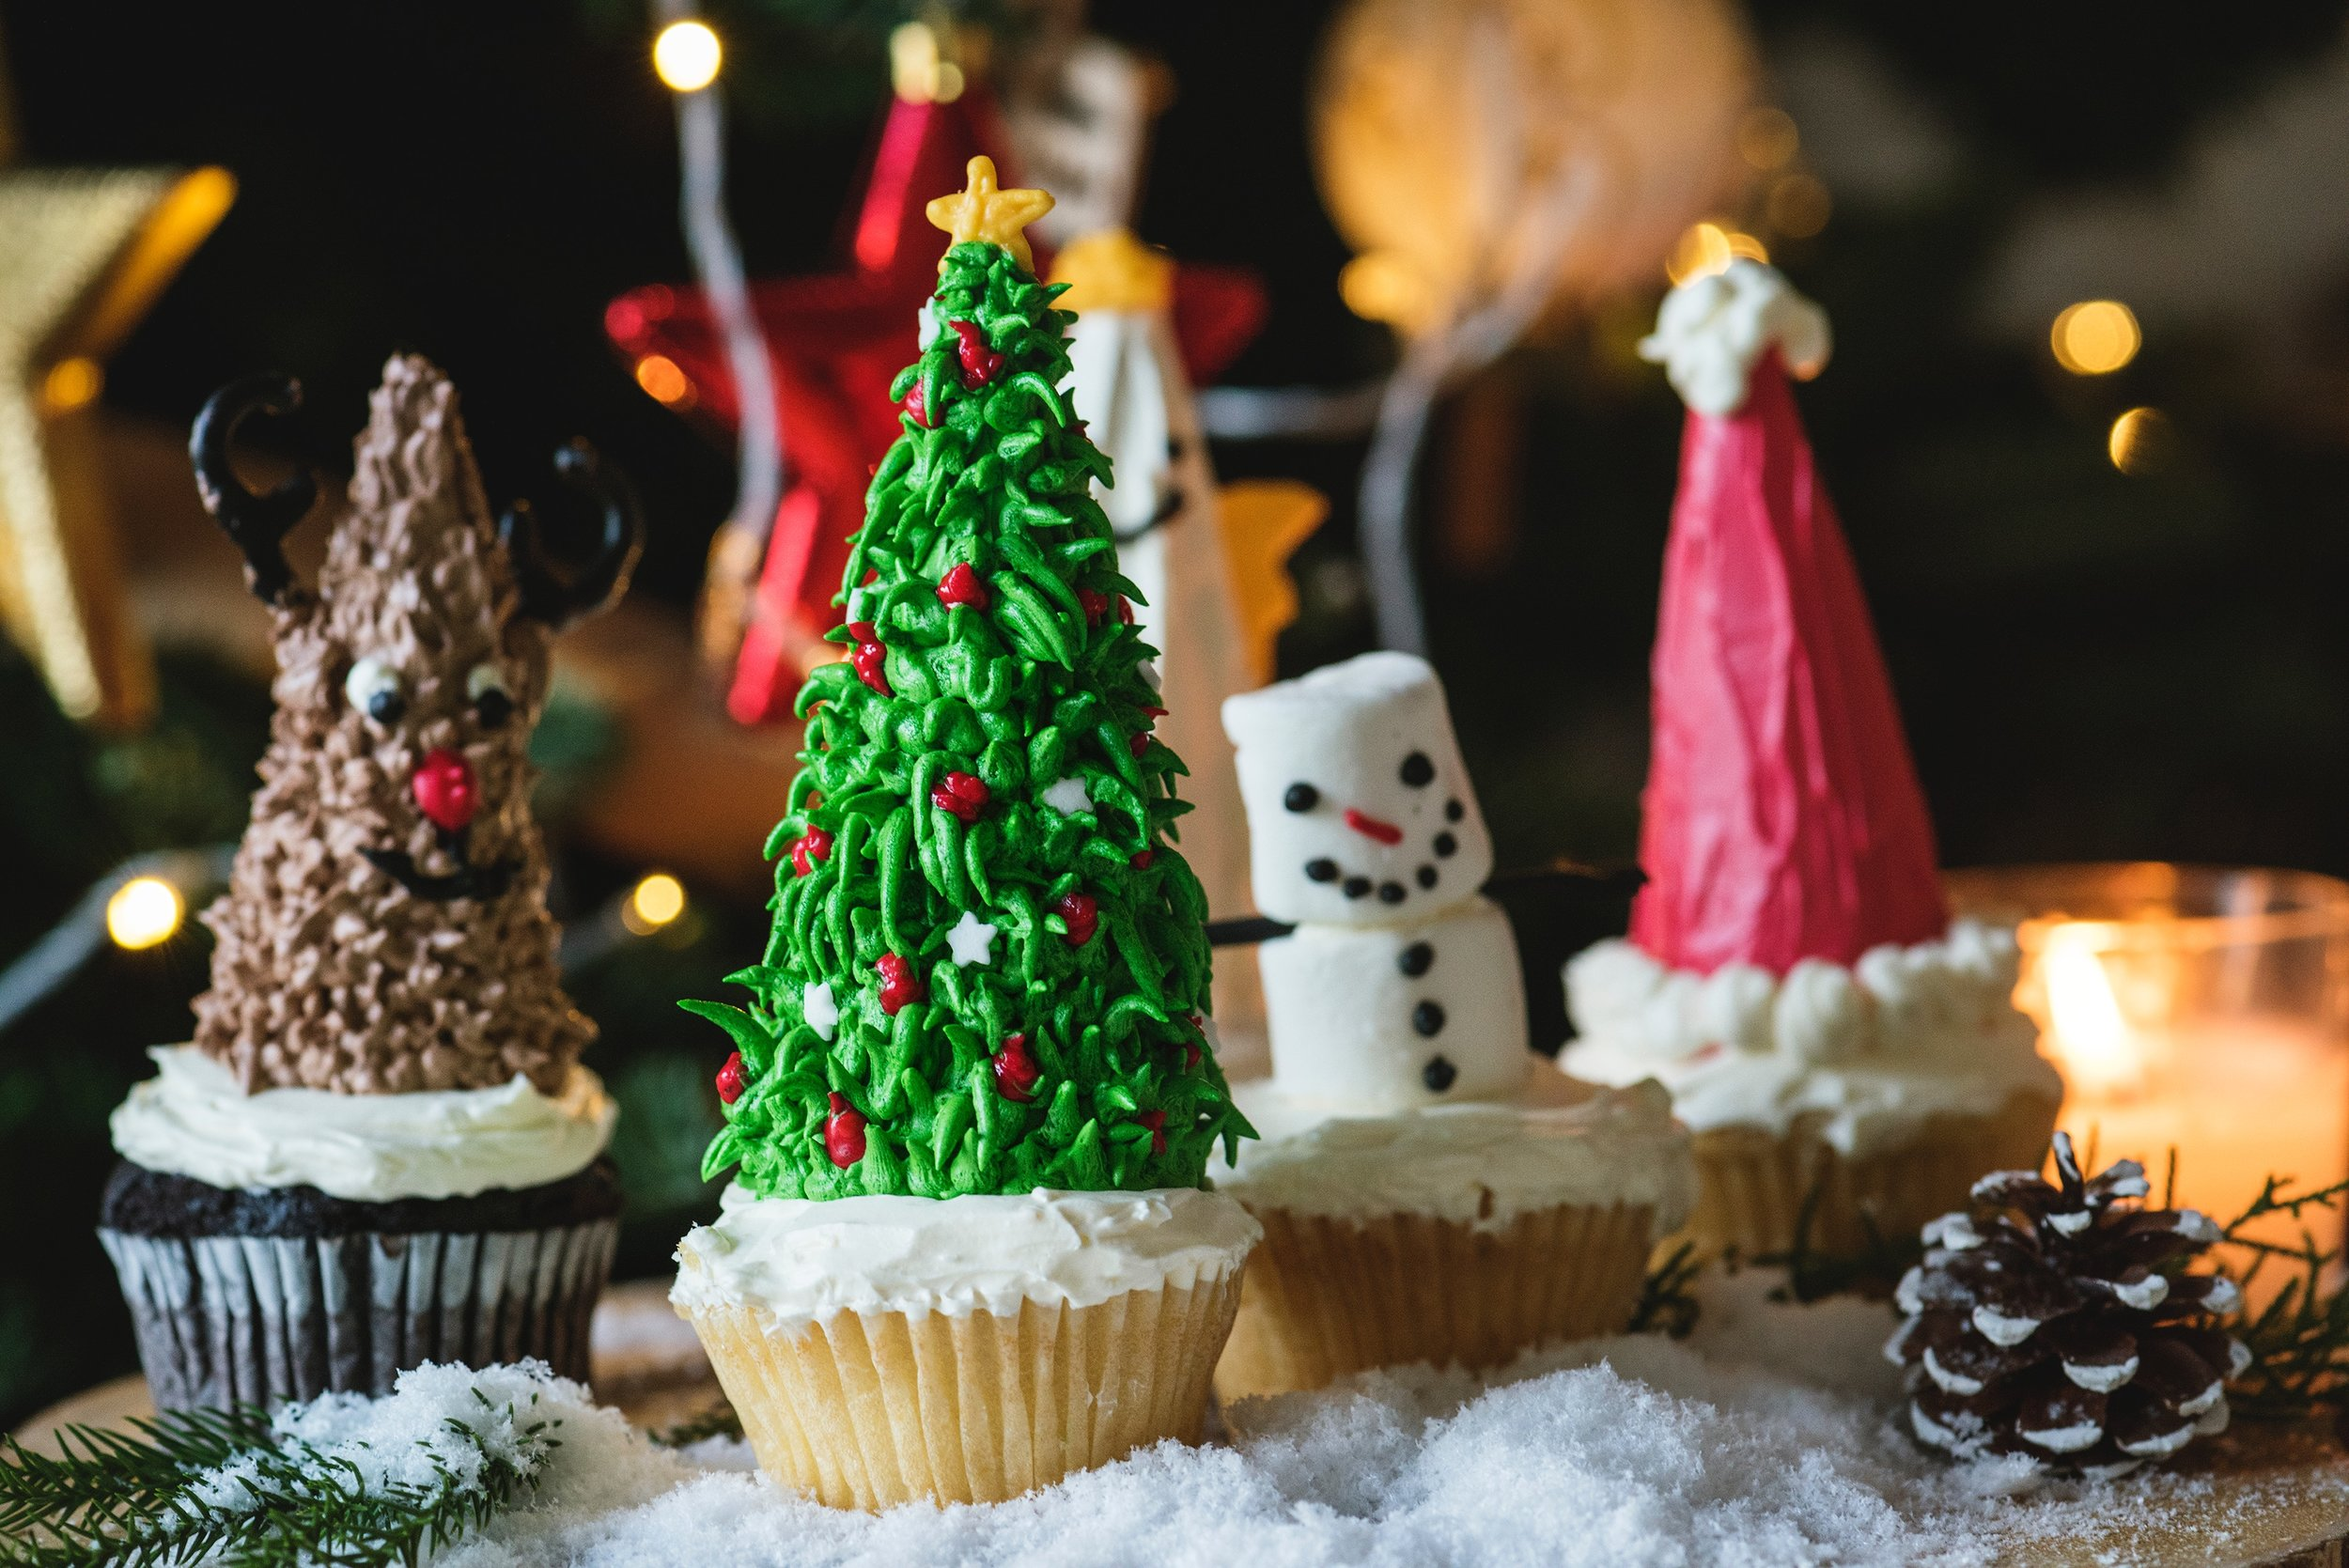 Christmas Cakes APL